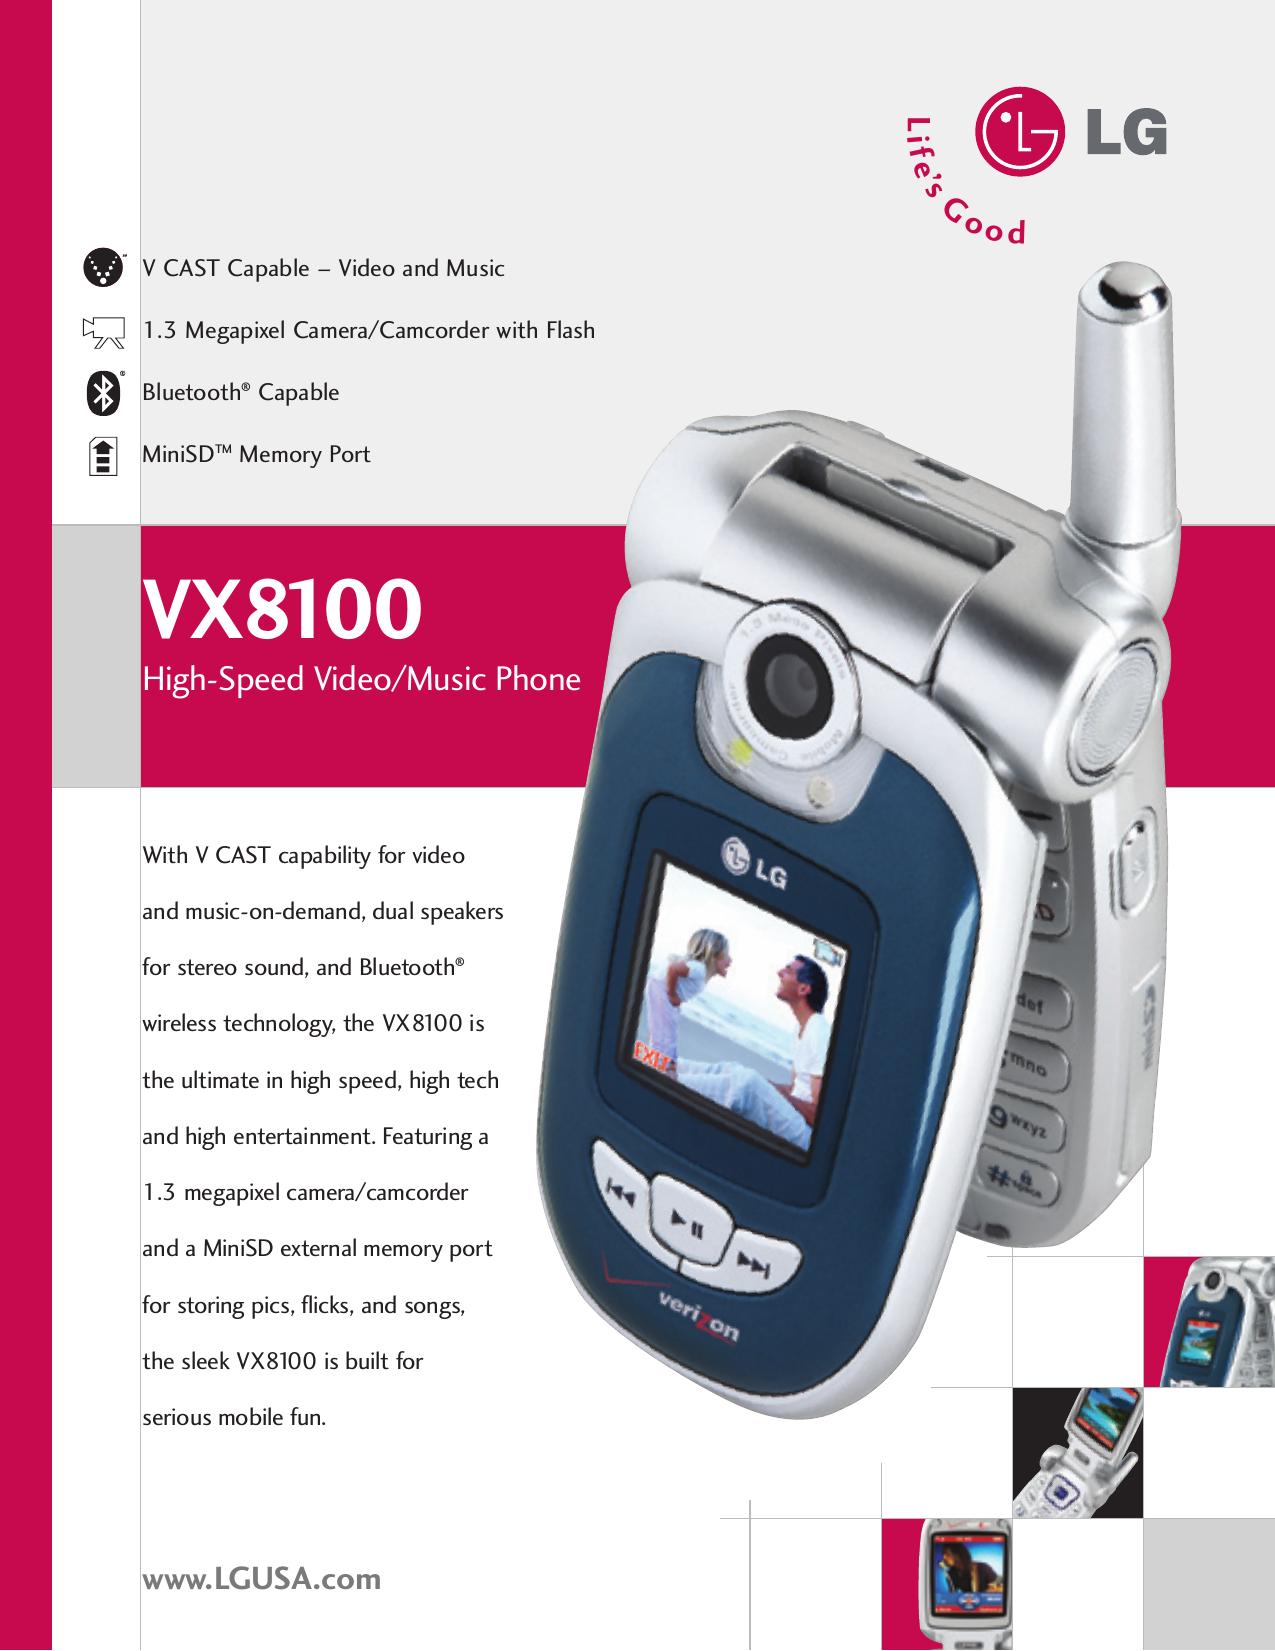 lg vx8100 vx8100 datasheet 06 user manual data sheet datasheet mod rh usermanual wiki LG 8100 Manual LG Vx82100